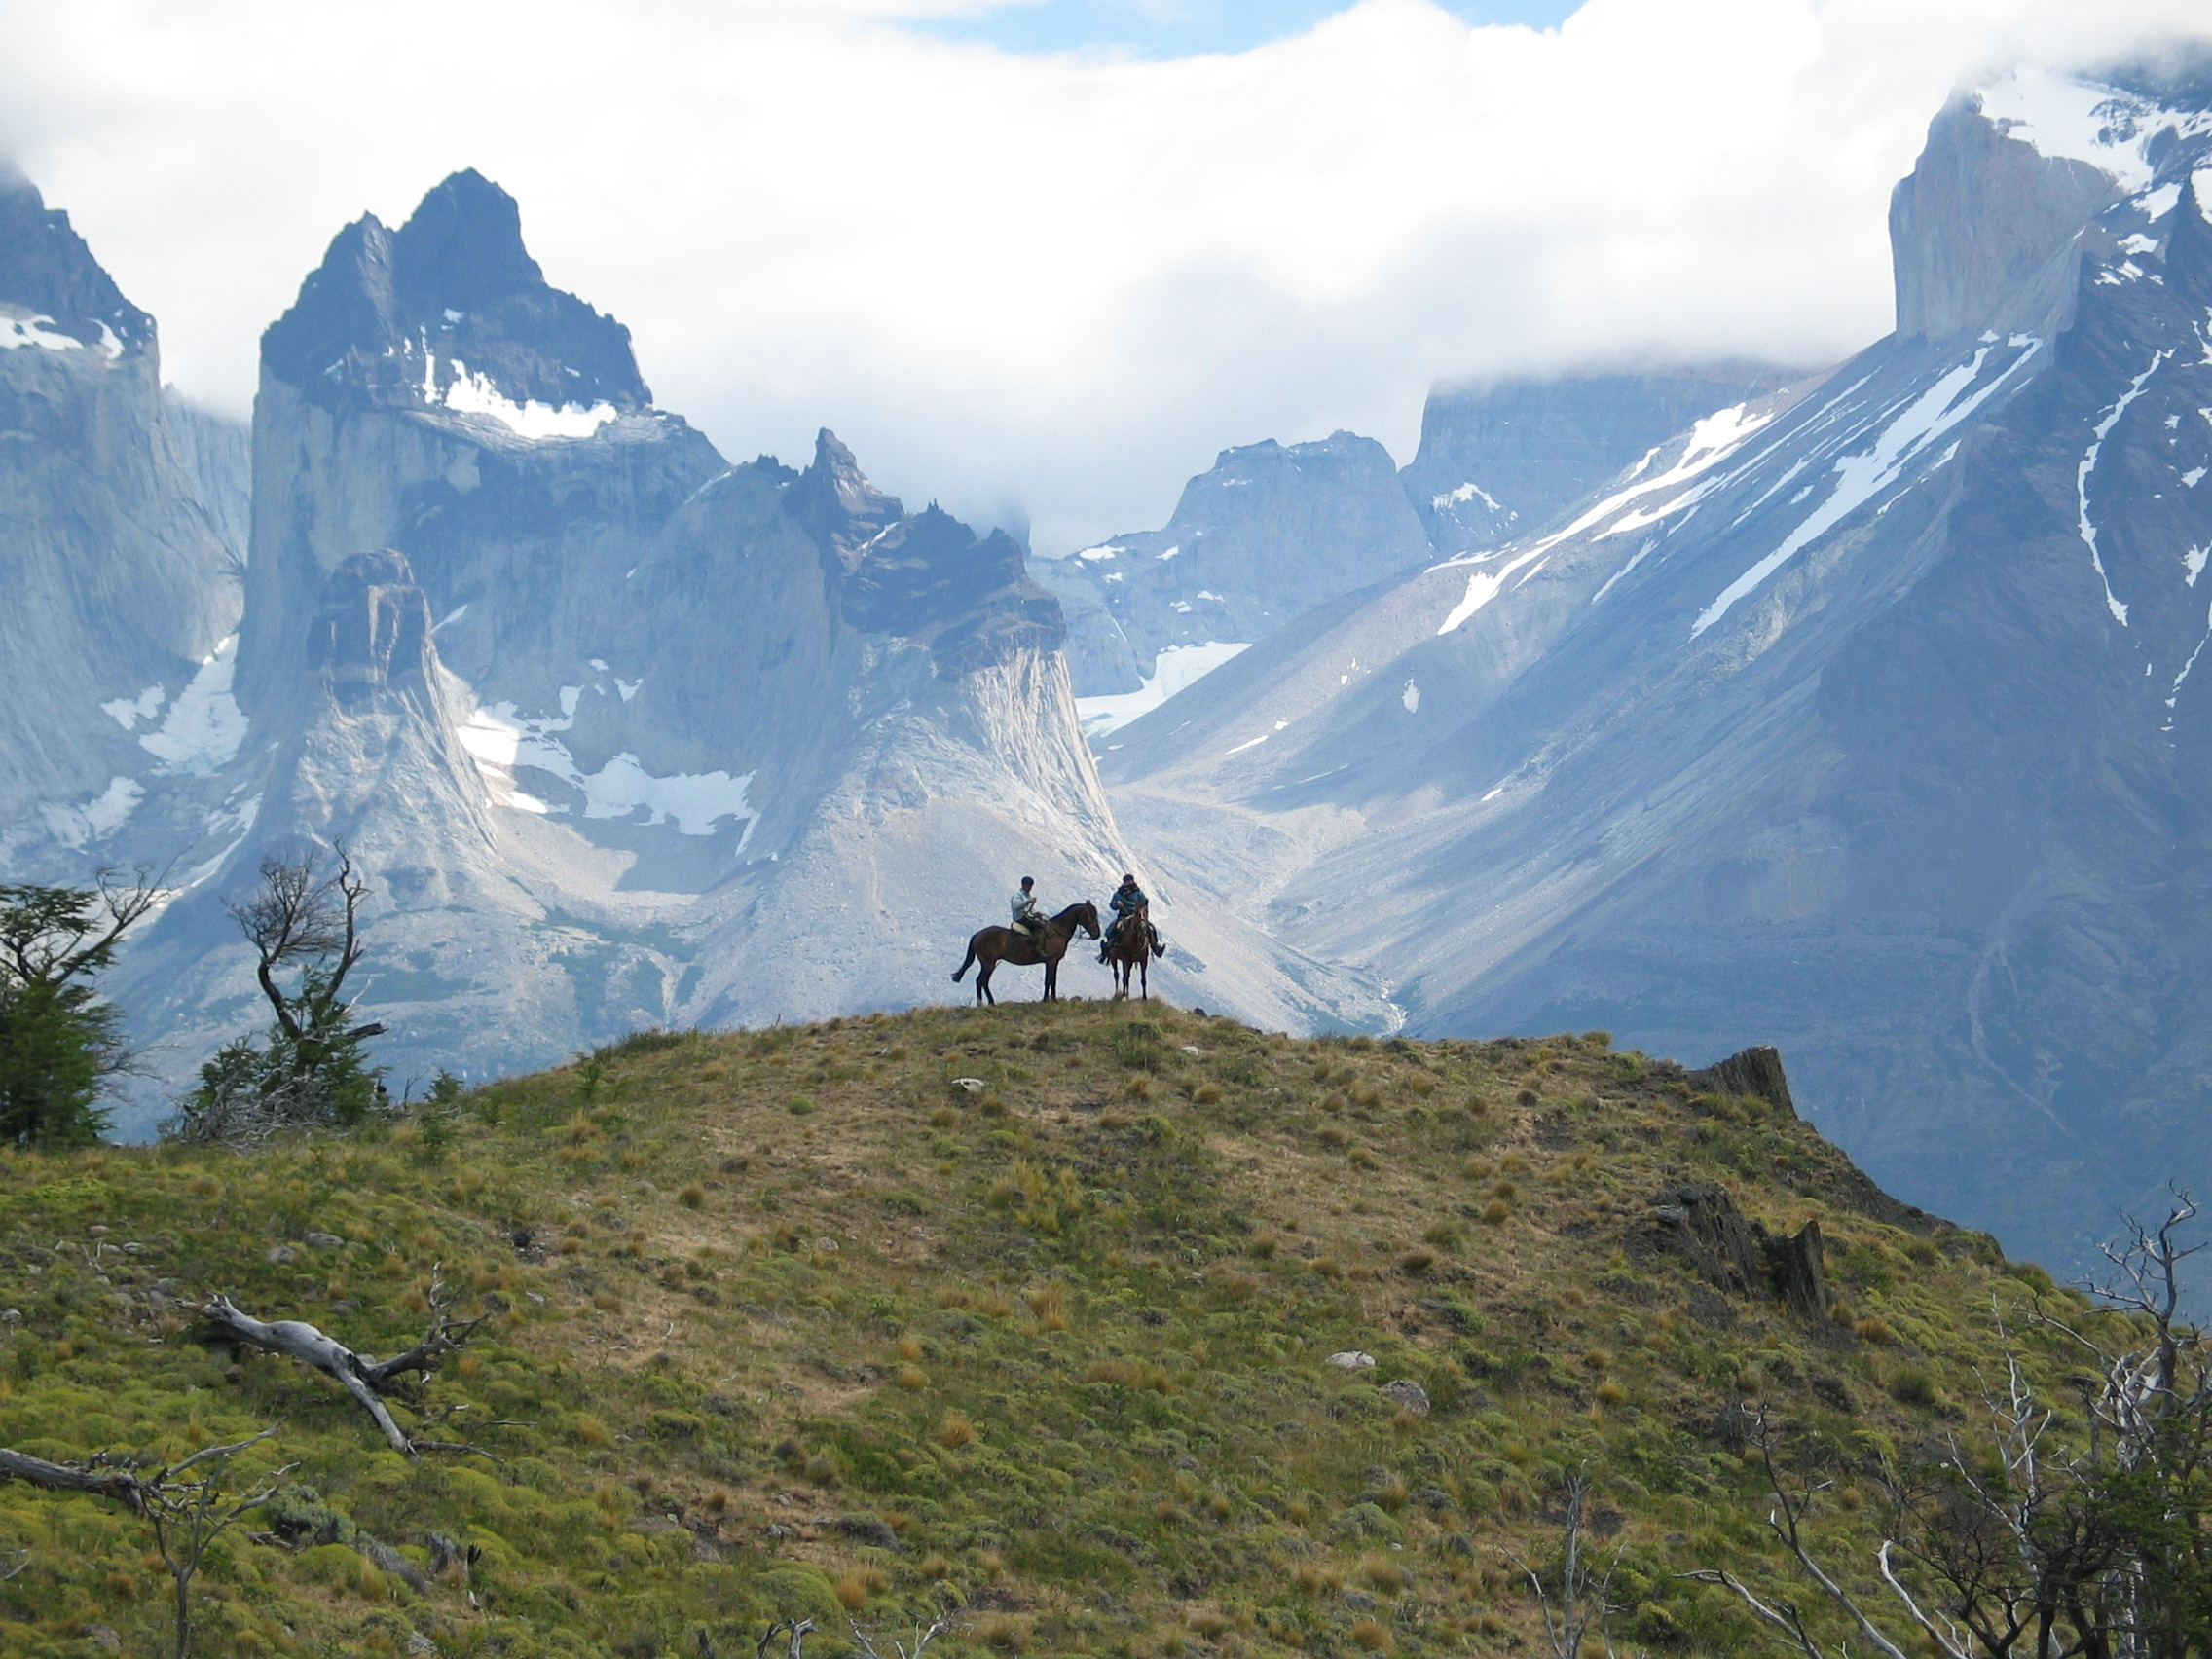 Torres del Paine te paard (Chili) - Vakantie te paard / Reisbureau Perlan